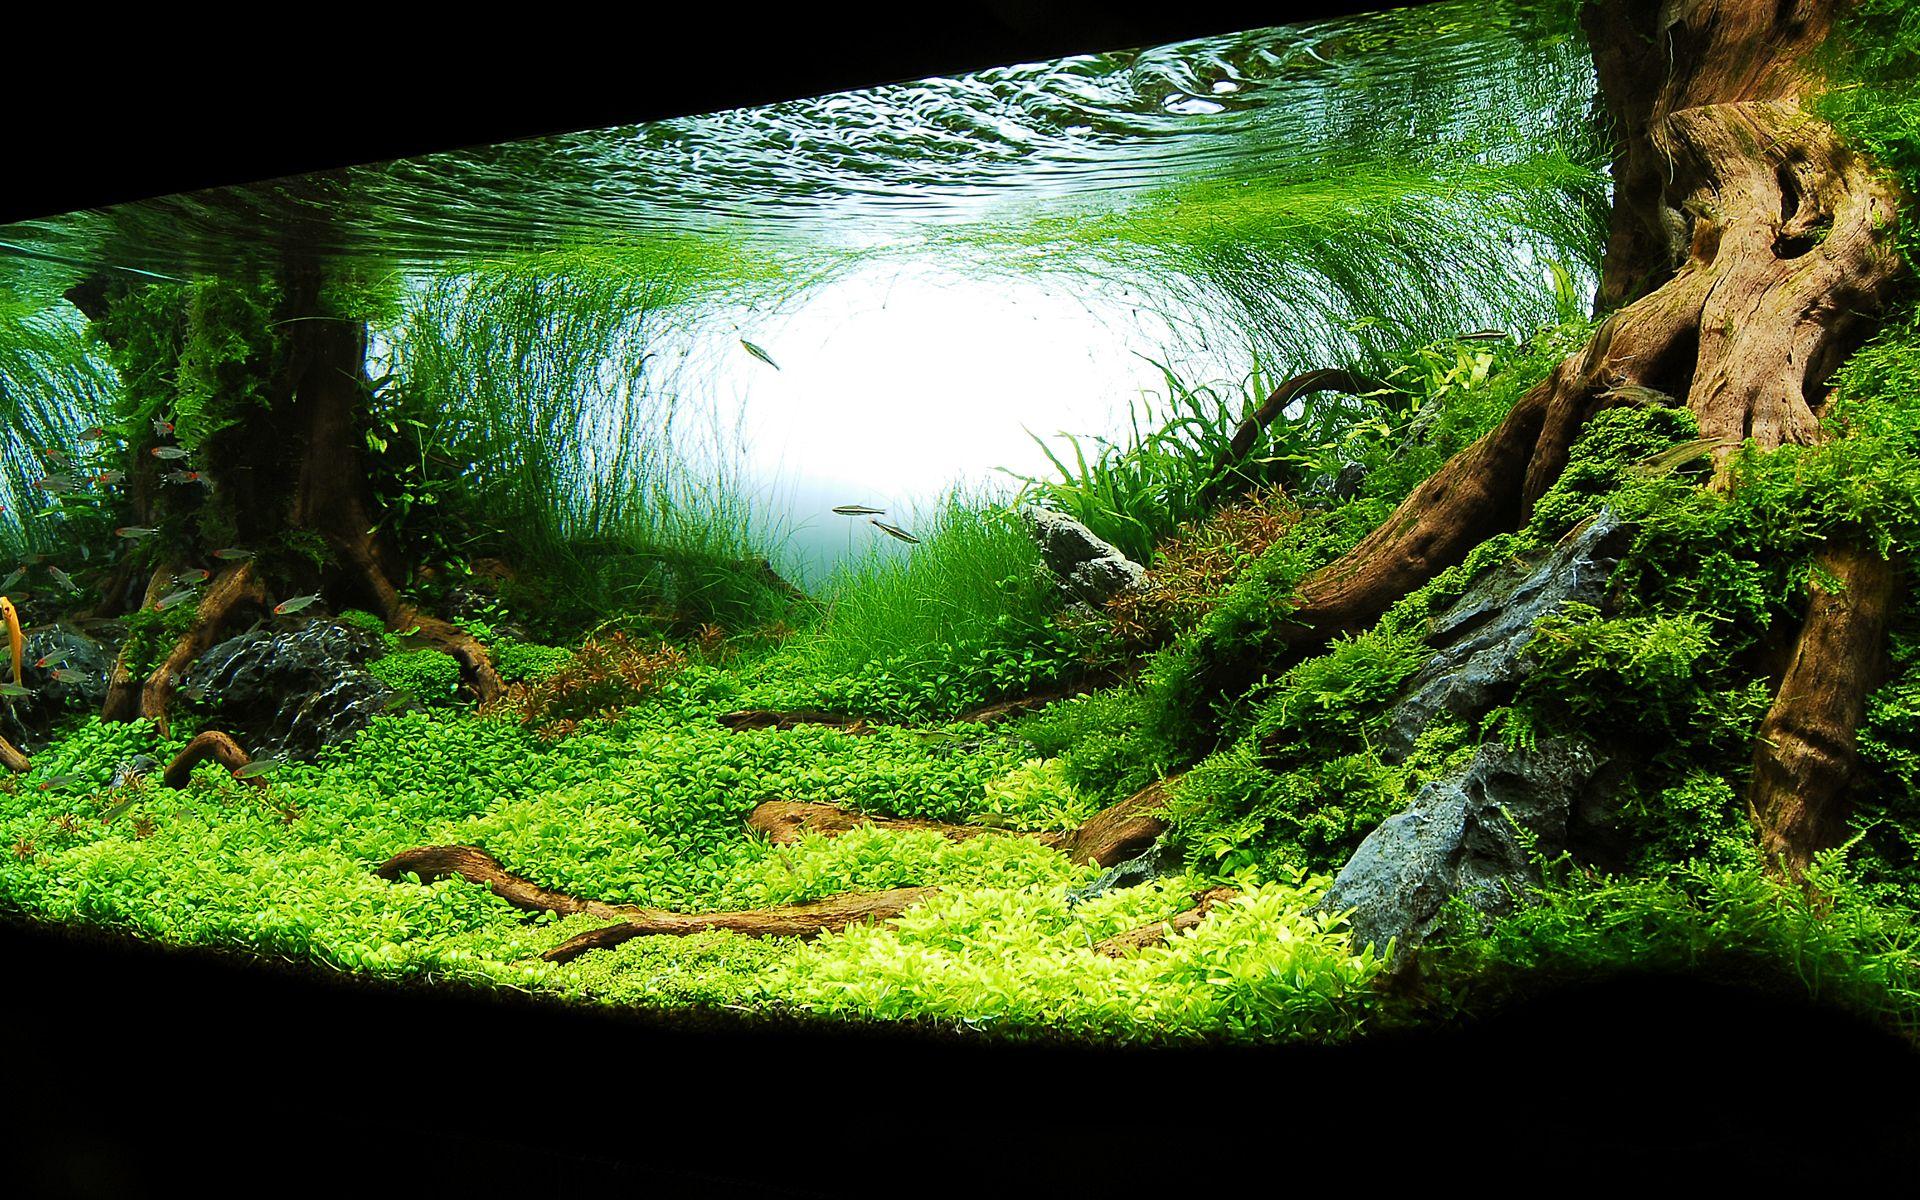 6d7ac1262301c6e46a82867ac2d98fde Frais De Aquarium En Bois Schème